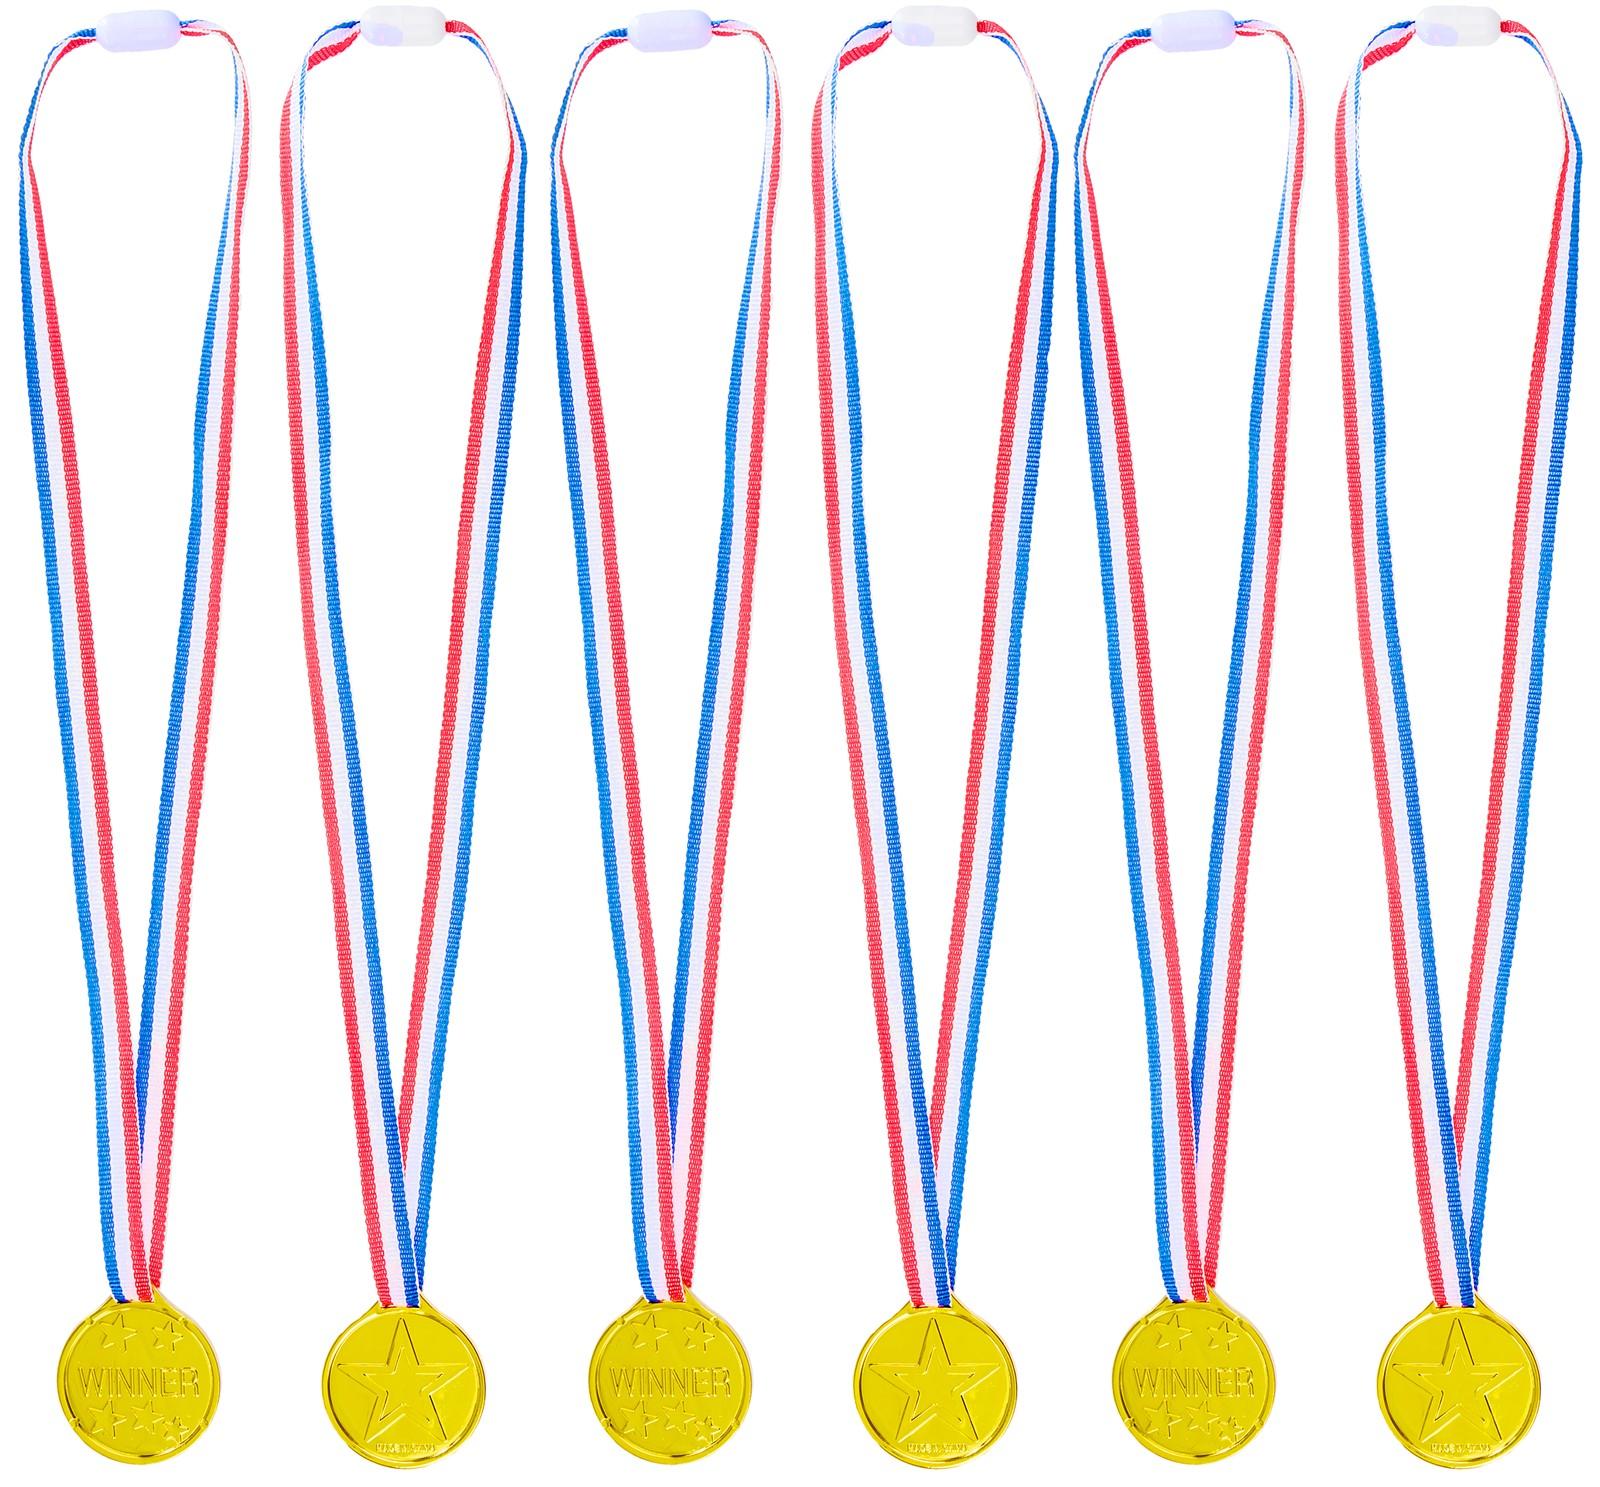 GOLD MEDAL WINNER Pack de 24 Plastique Médailles School Gaming prix fêtes